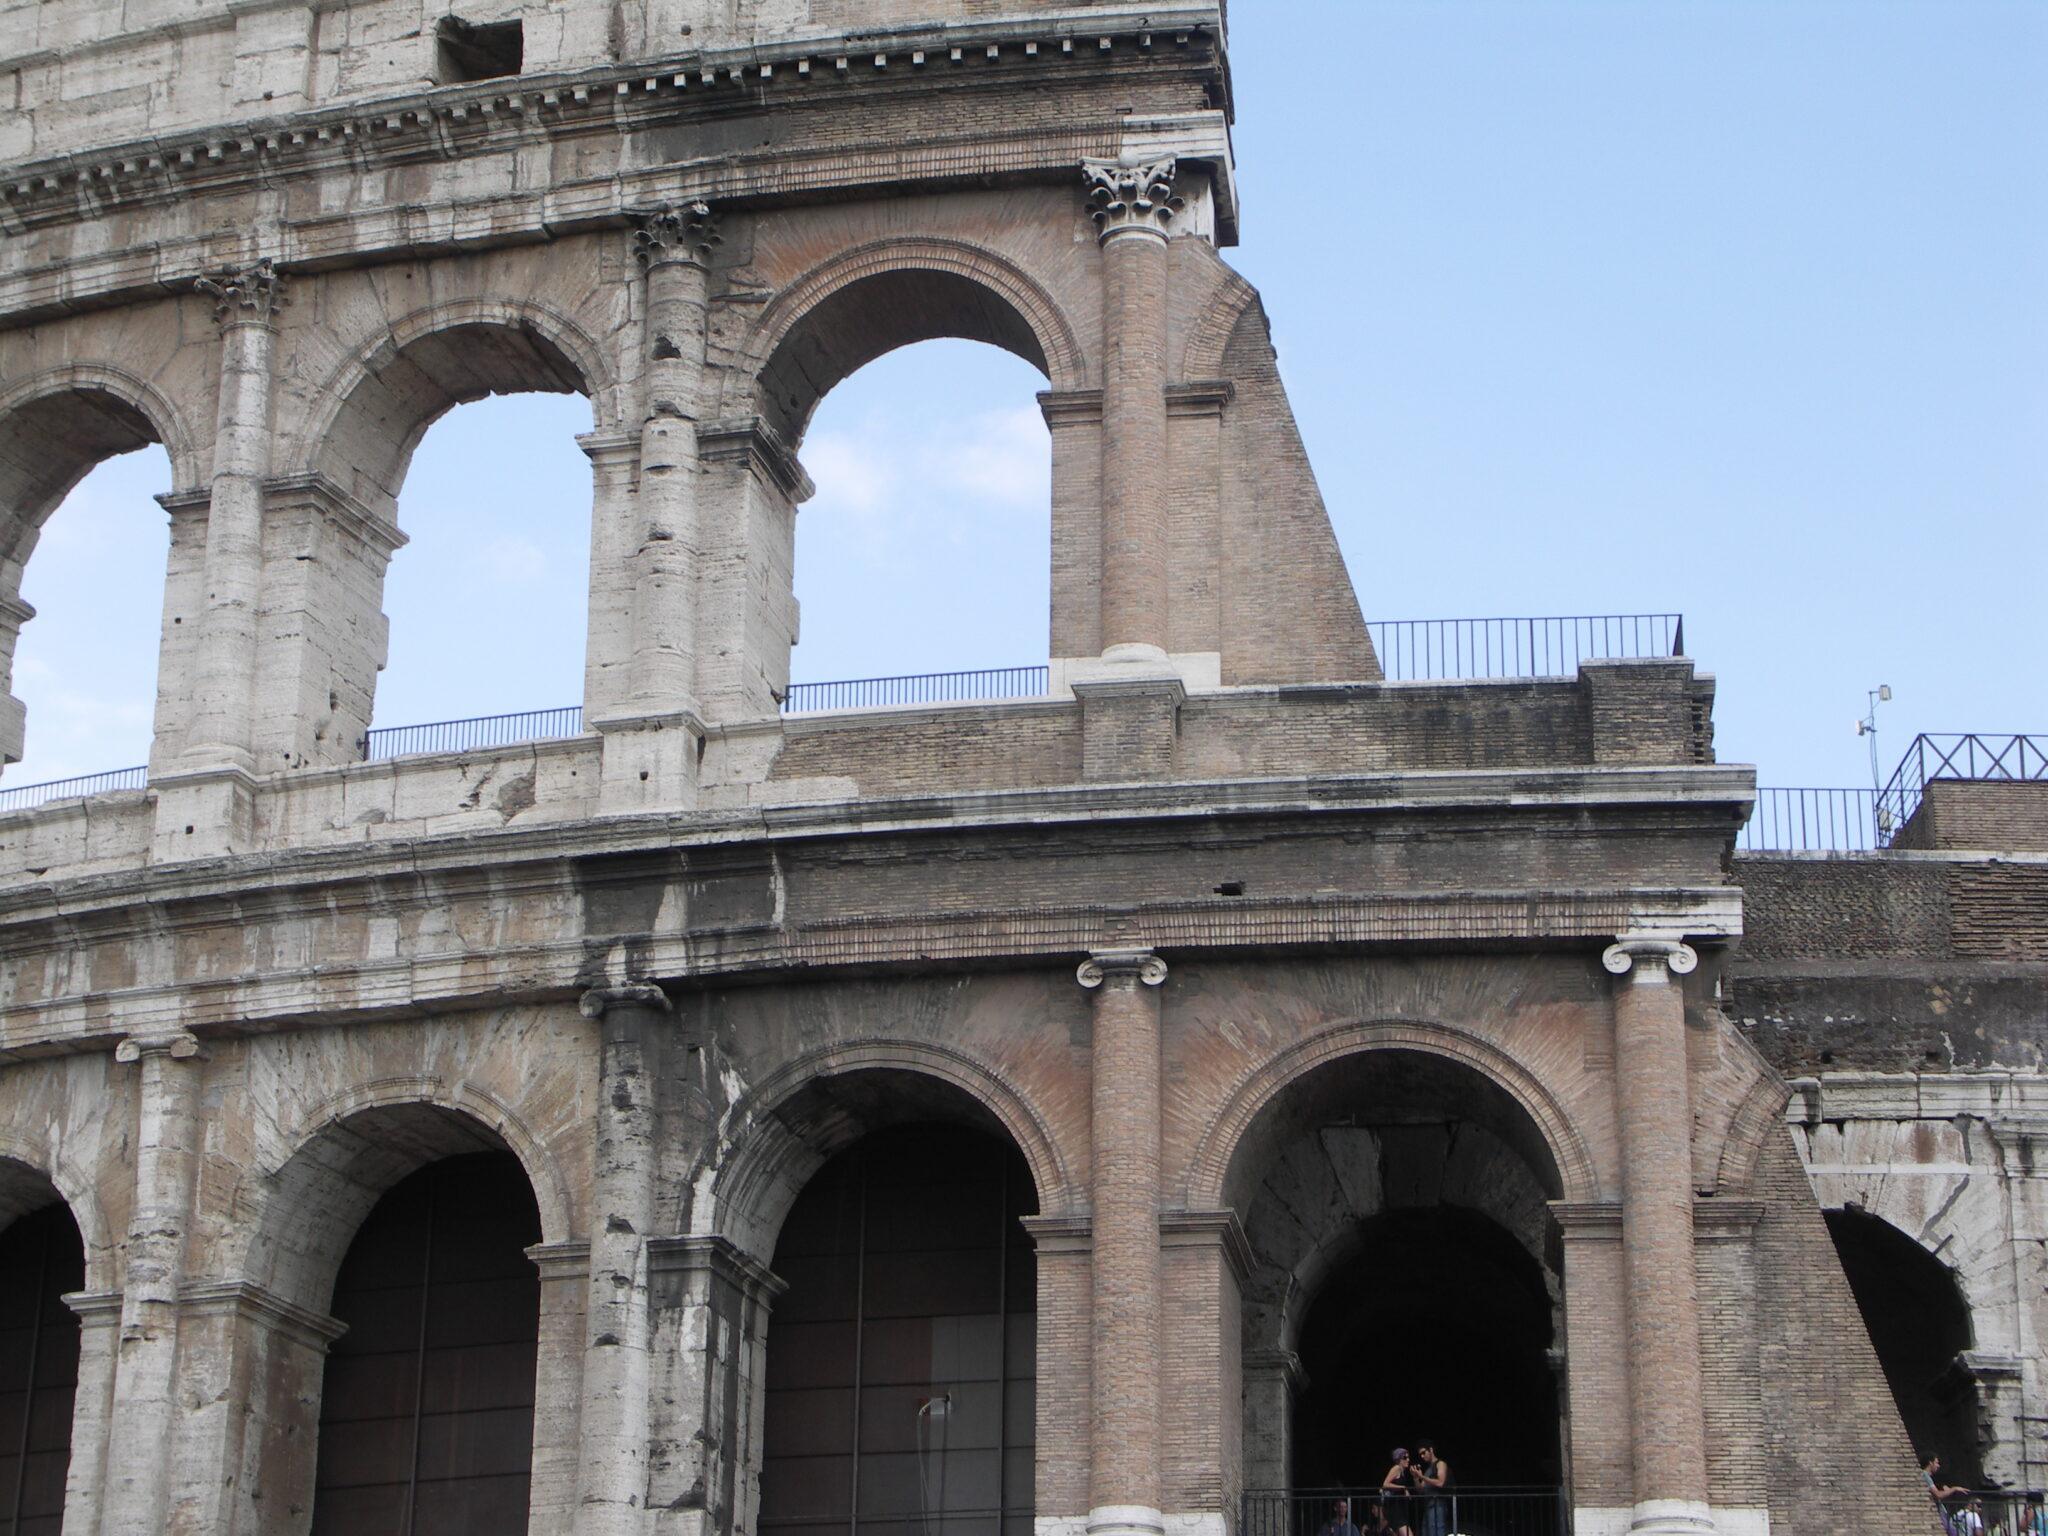 Rome's-Colosseum-by-Casale-Sonnino